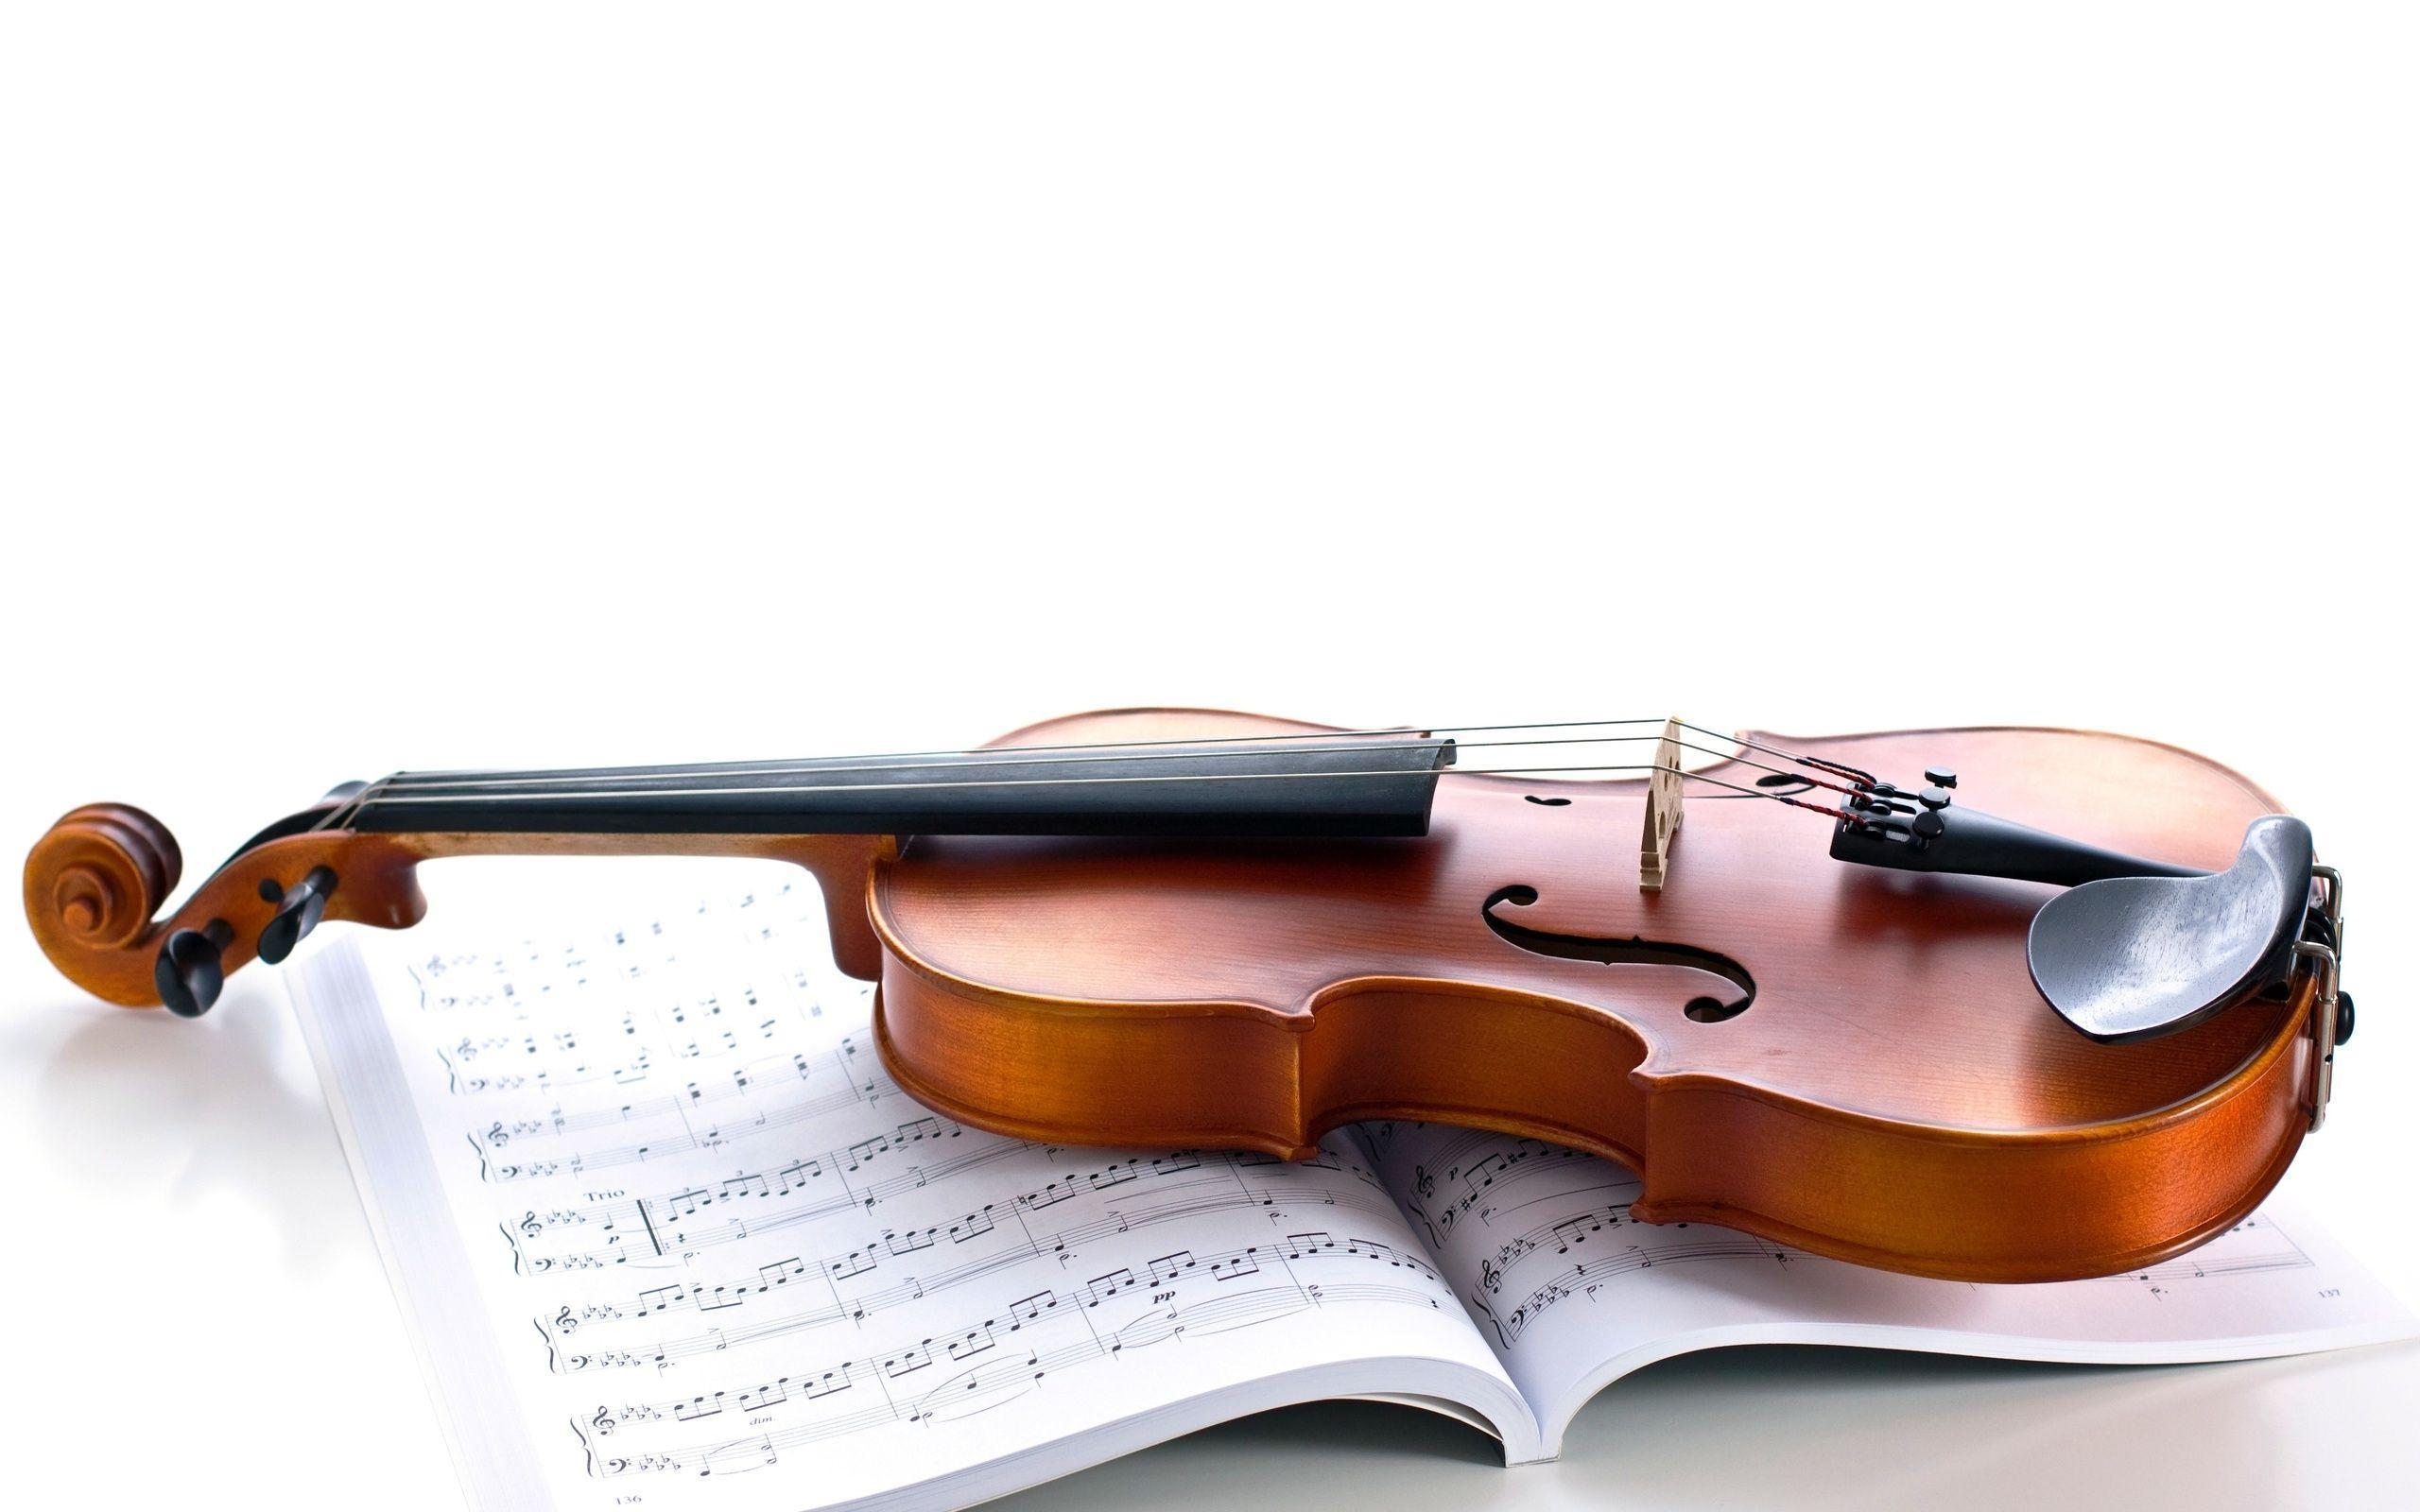 Violin Photo - Wallpaper, High Definition, High Quality, Widescreen